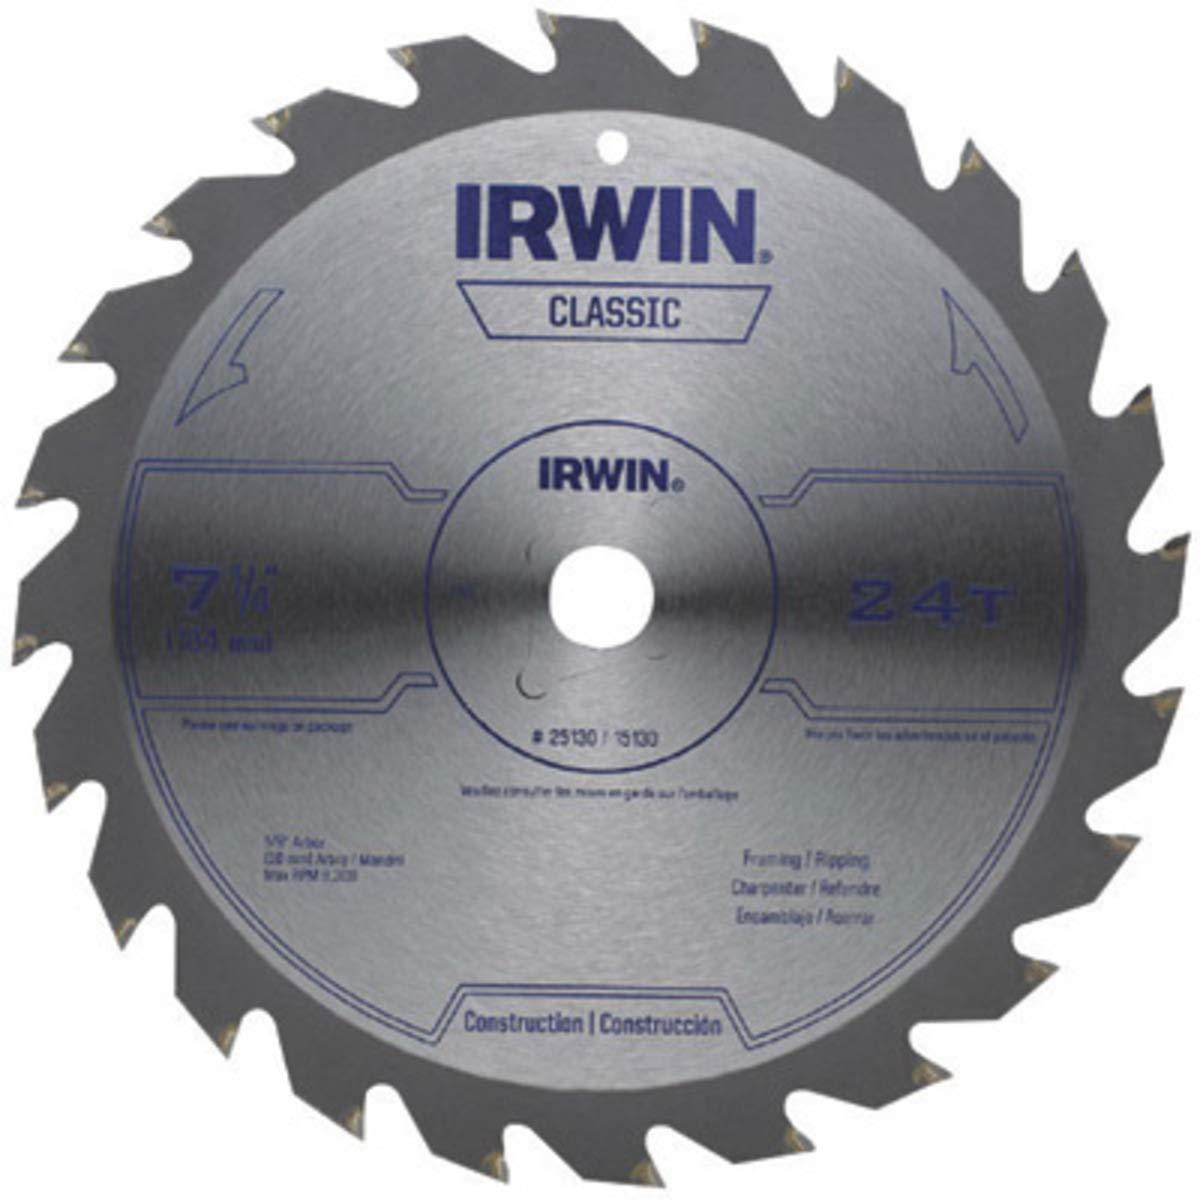 IRWIN 7 1/4'' X 5/8'' X .055'' 8300 RPM 24 Teeth ATB Grind Vise-Grip Sprint Series Classic Carbide Tipped Universal Circular Saw Blade (For Wood Cutting) (Bulk Package)